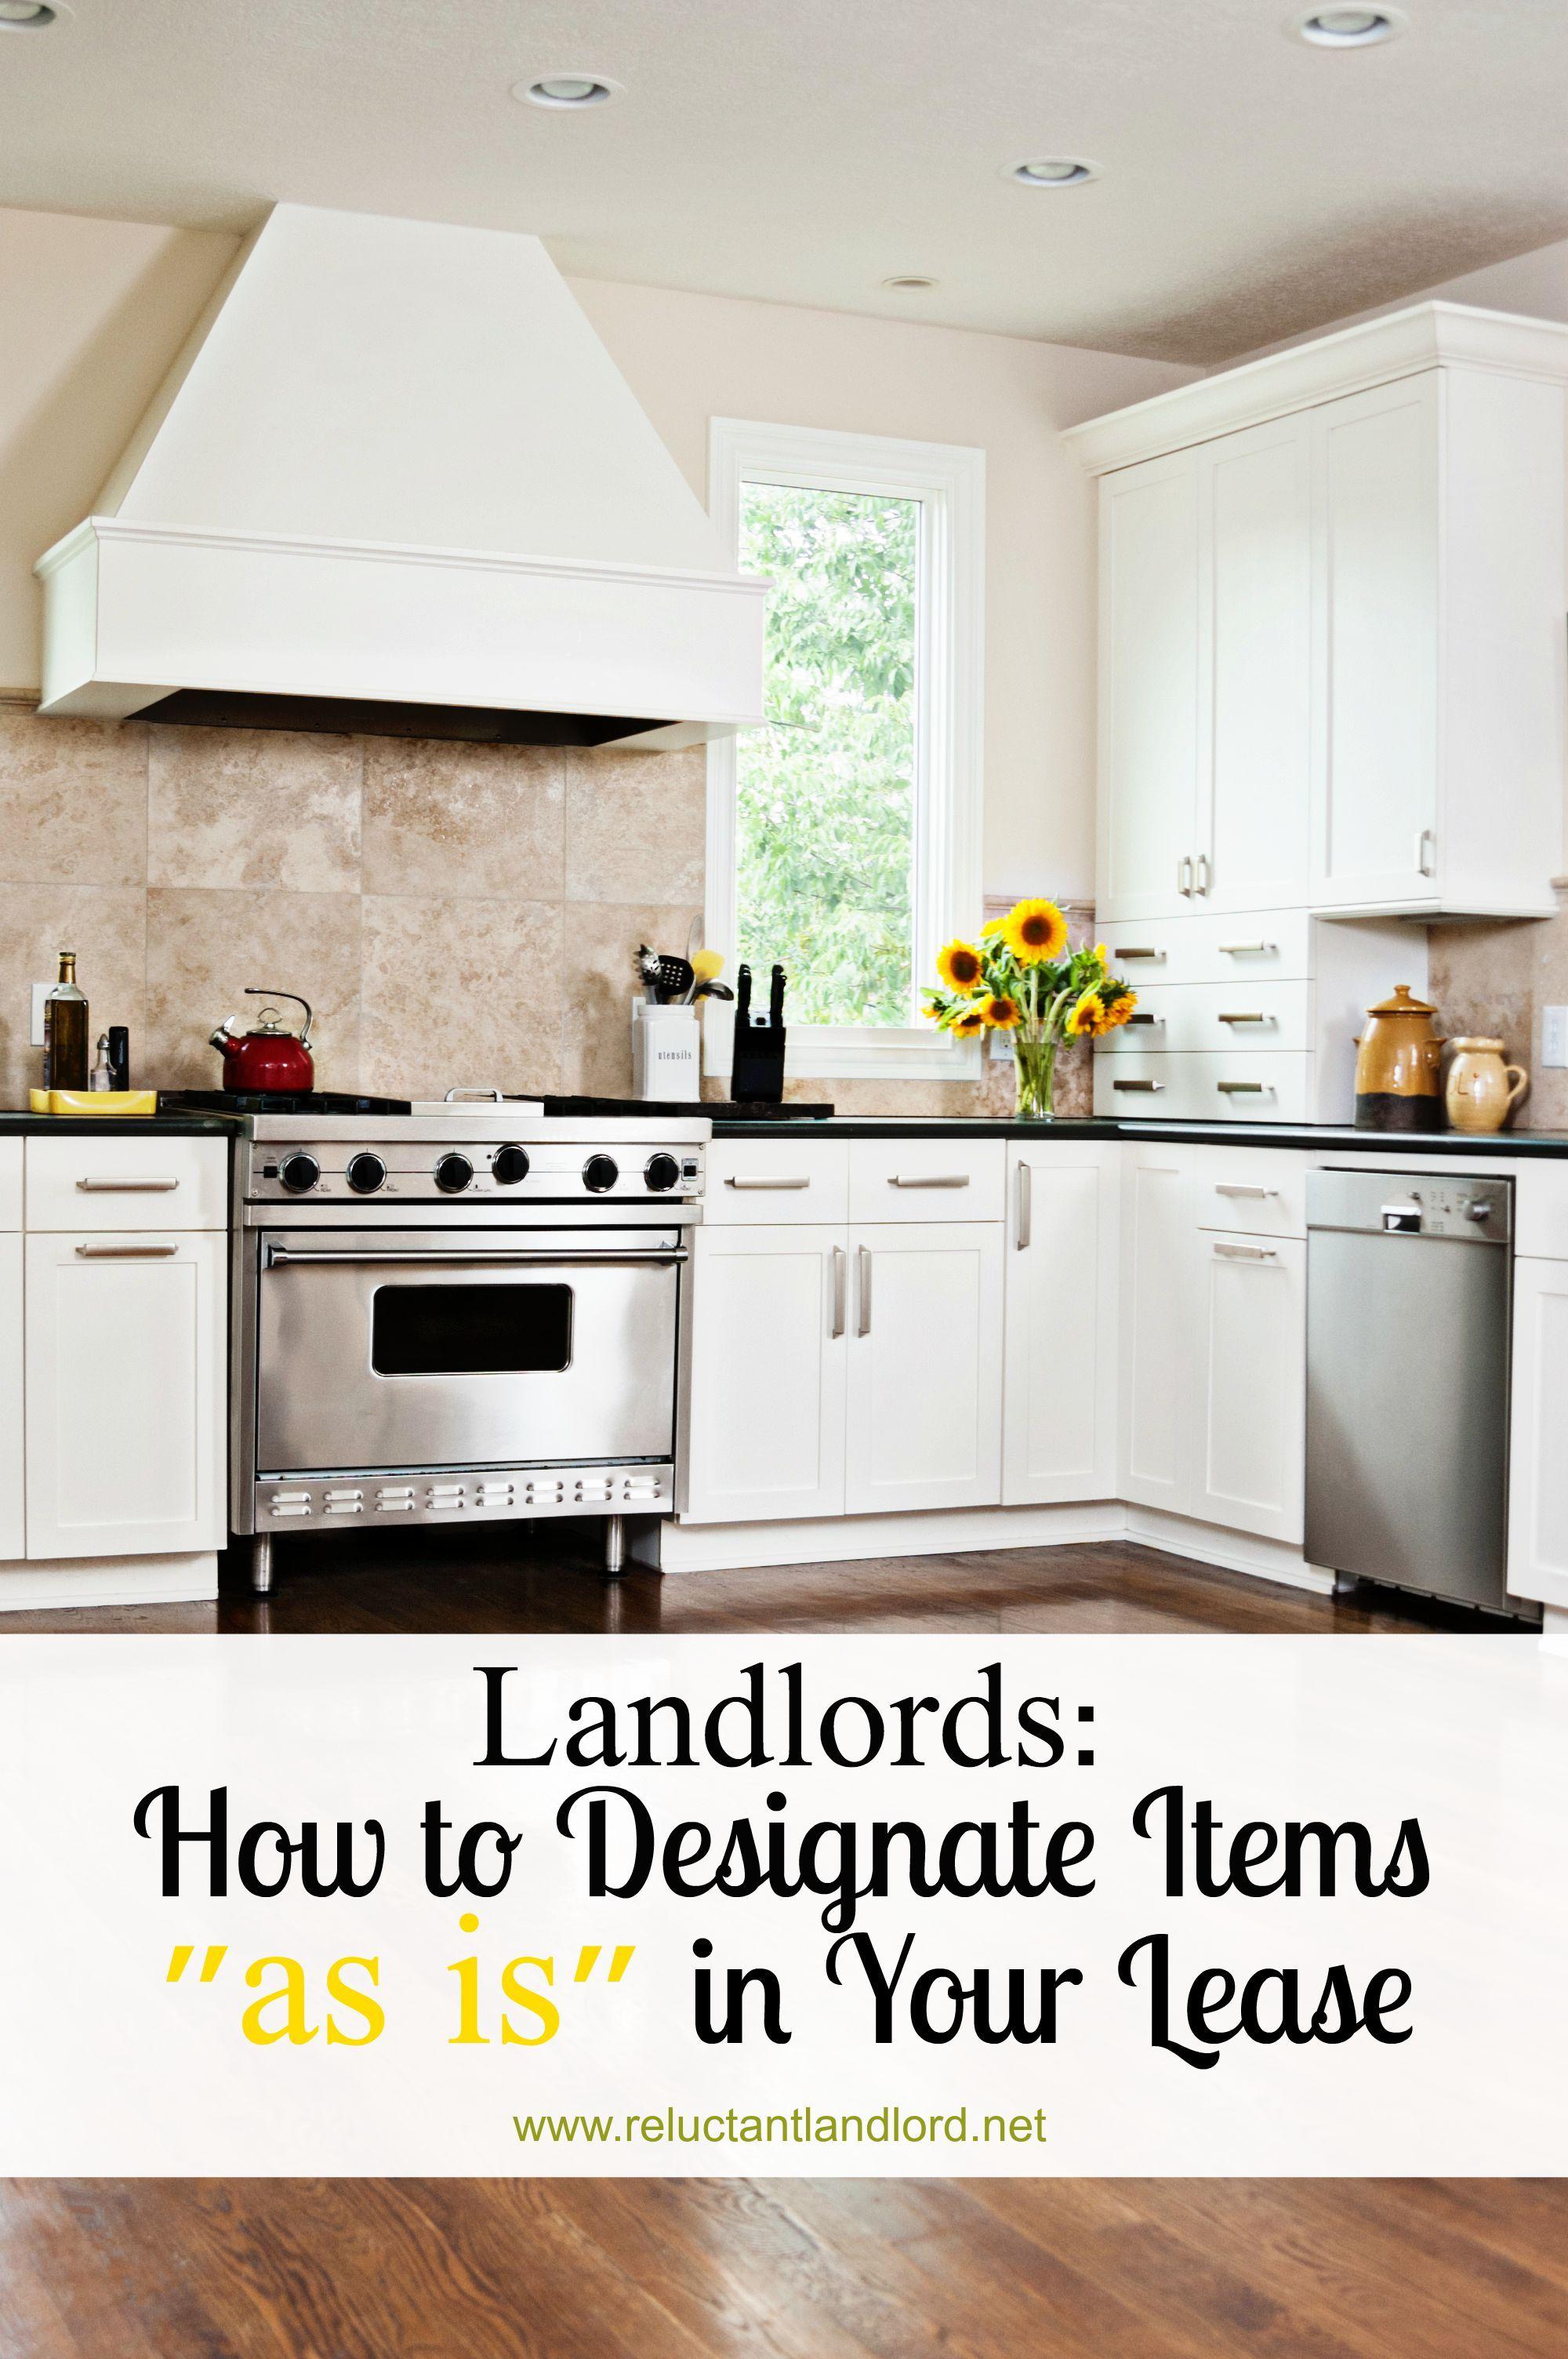 Landlords: How to Designate Items \